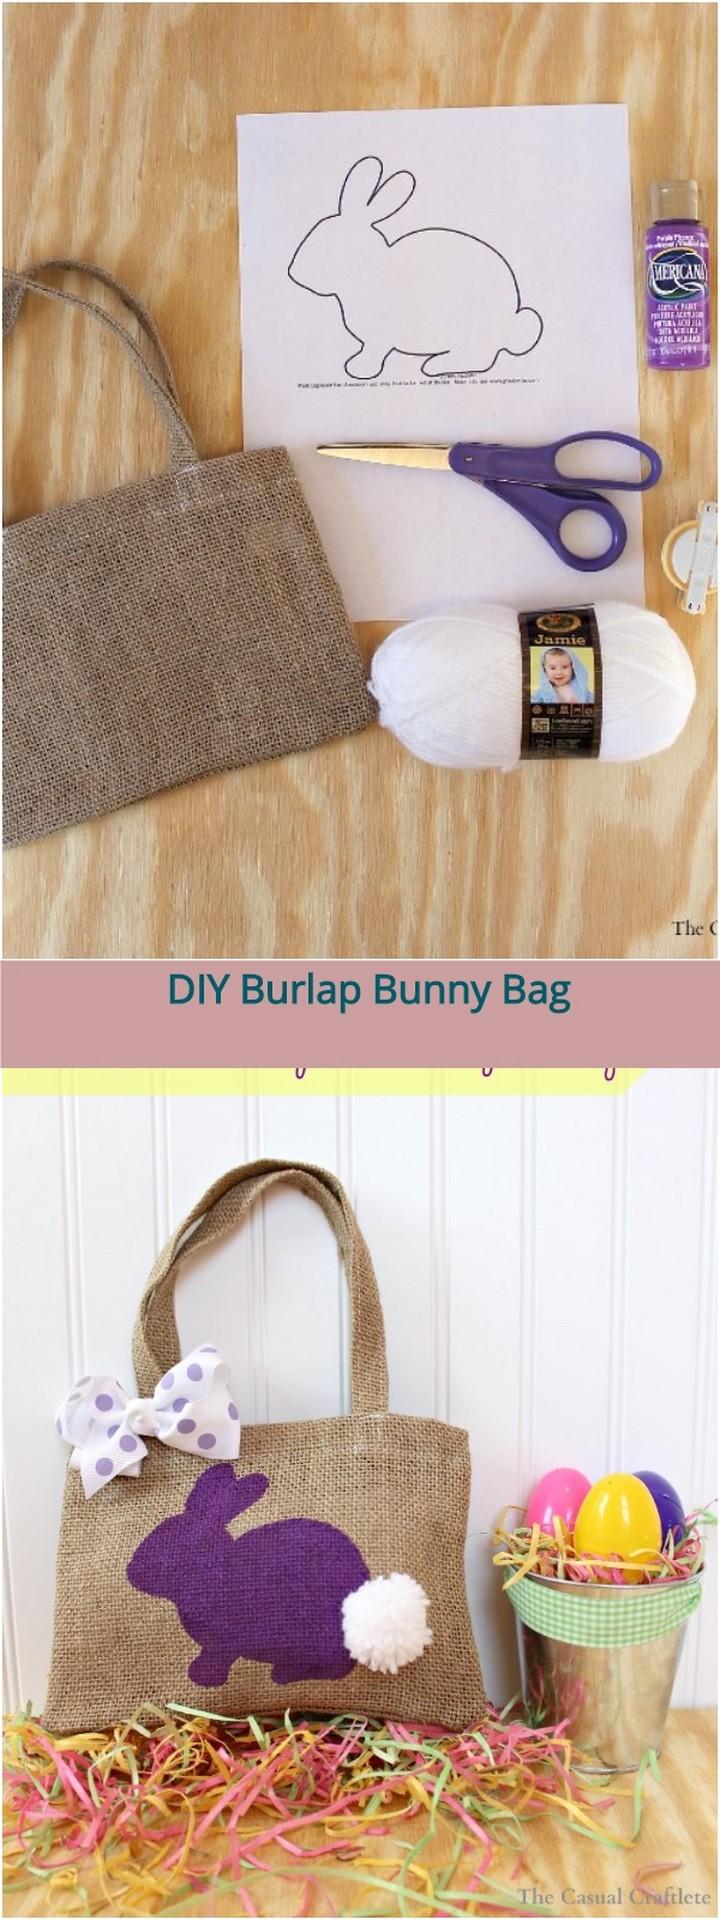 DIY Burlap Bunny Bag 1